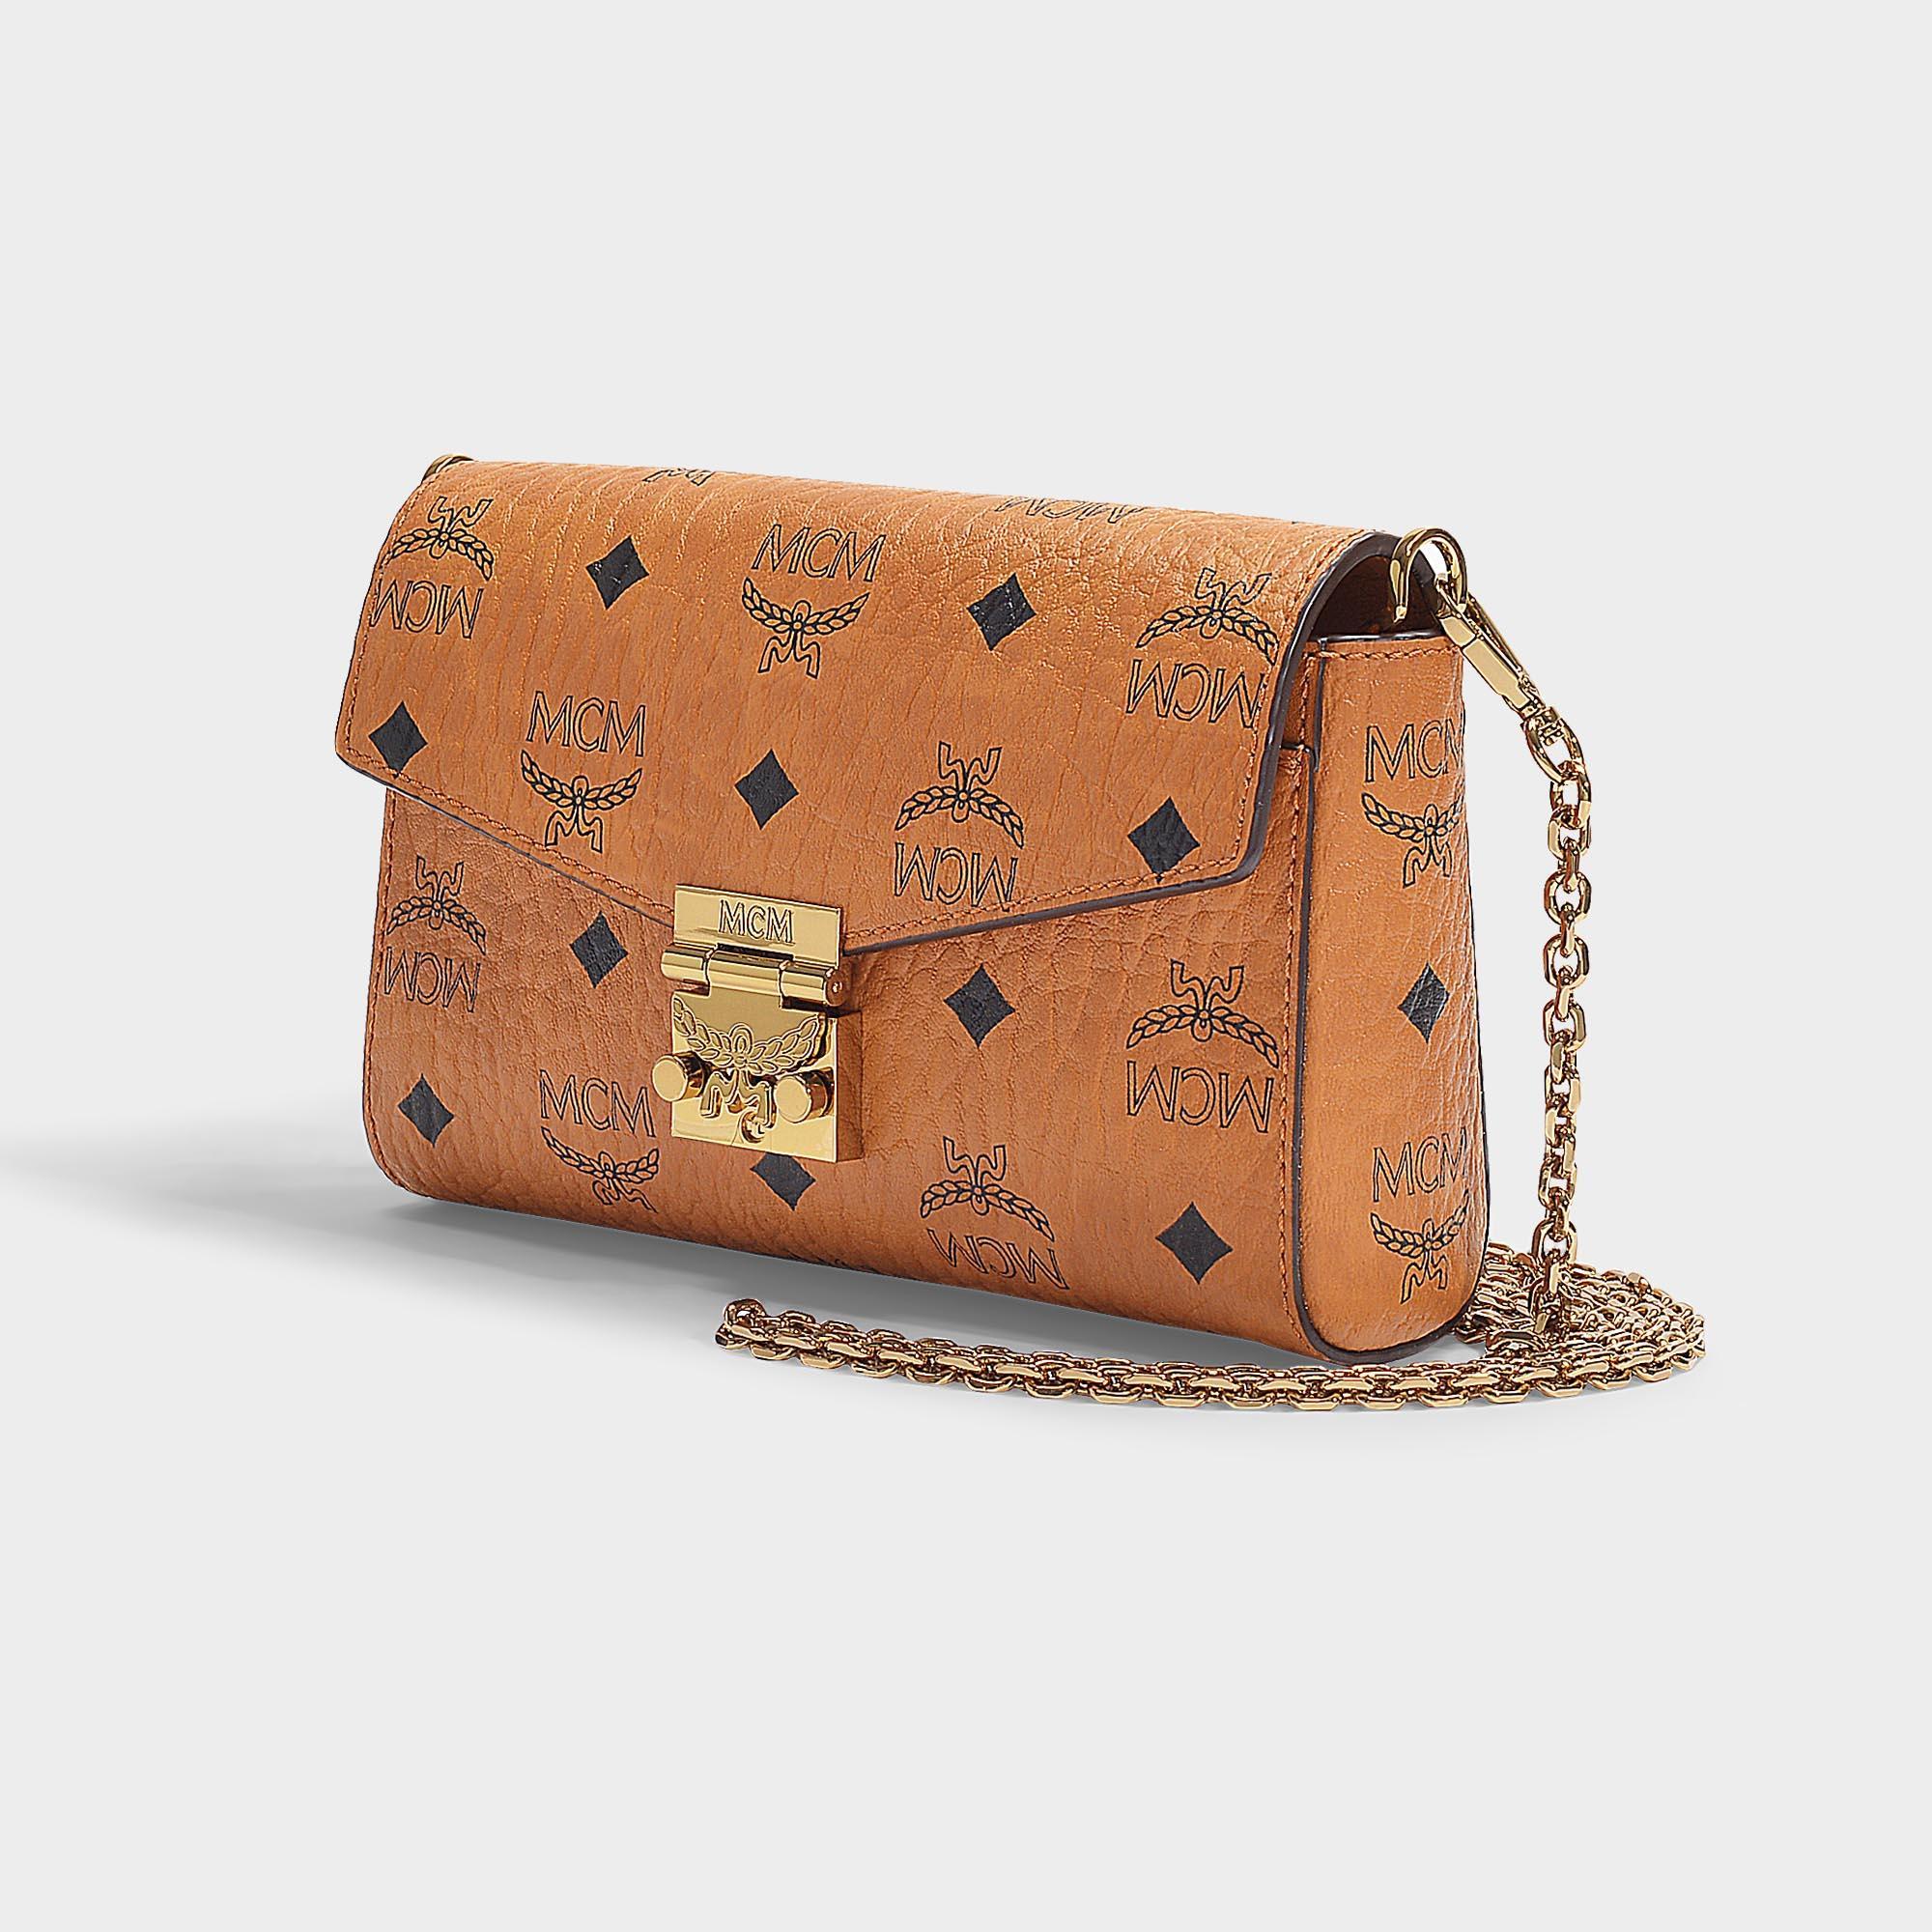 2c6197623 MCM Millie Visetos Small Crossbody Bag In Cognac Coated Canvas in ...